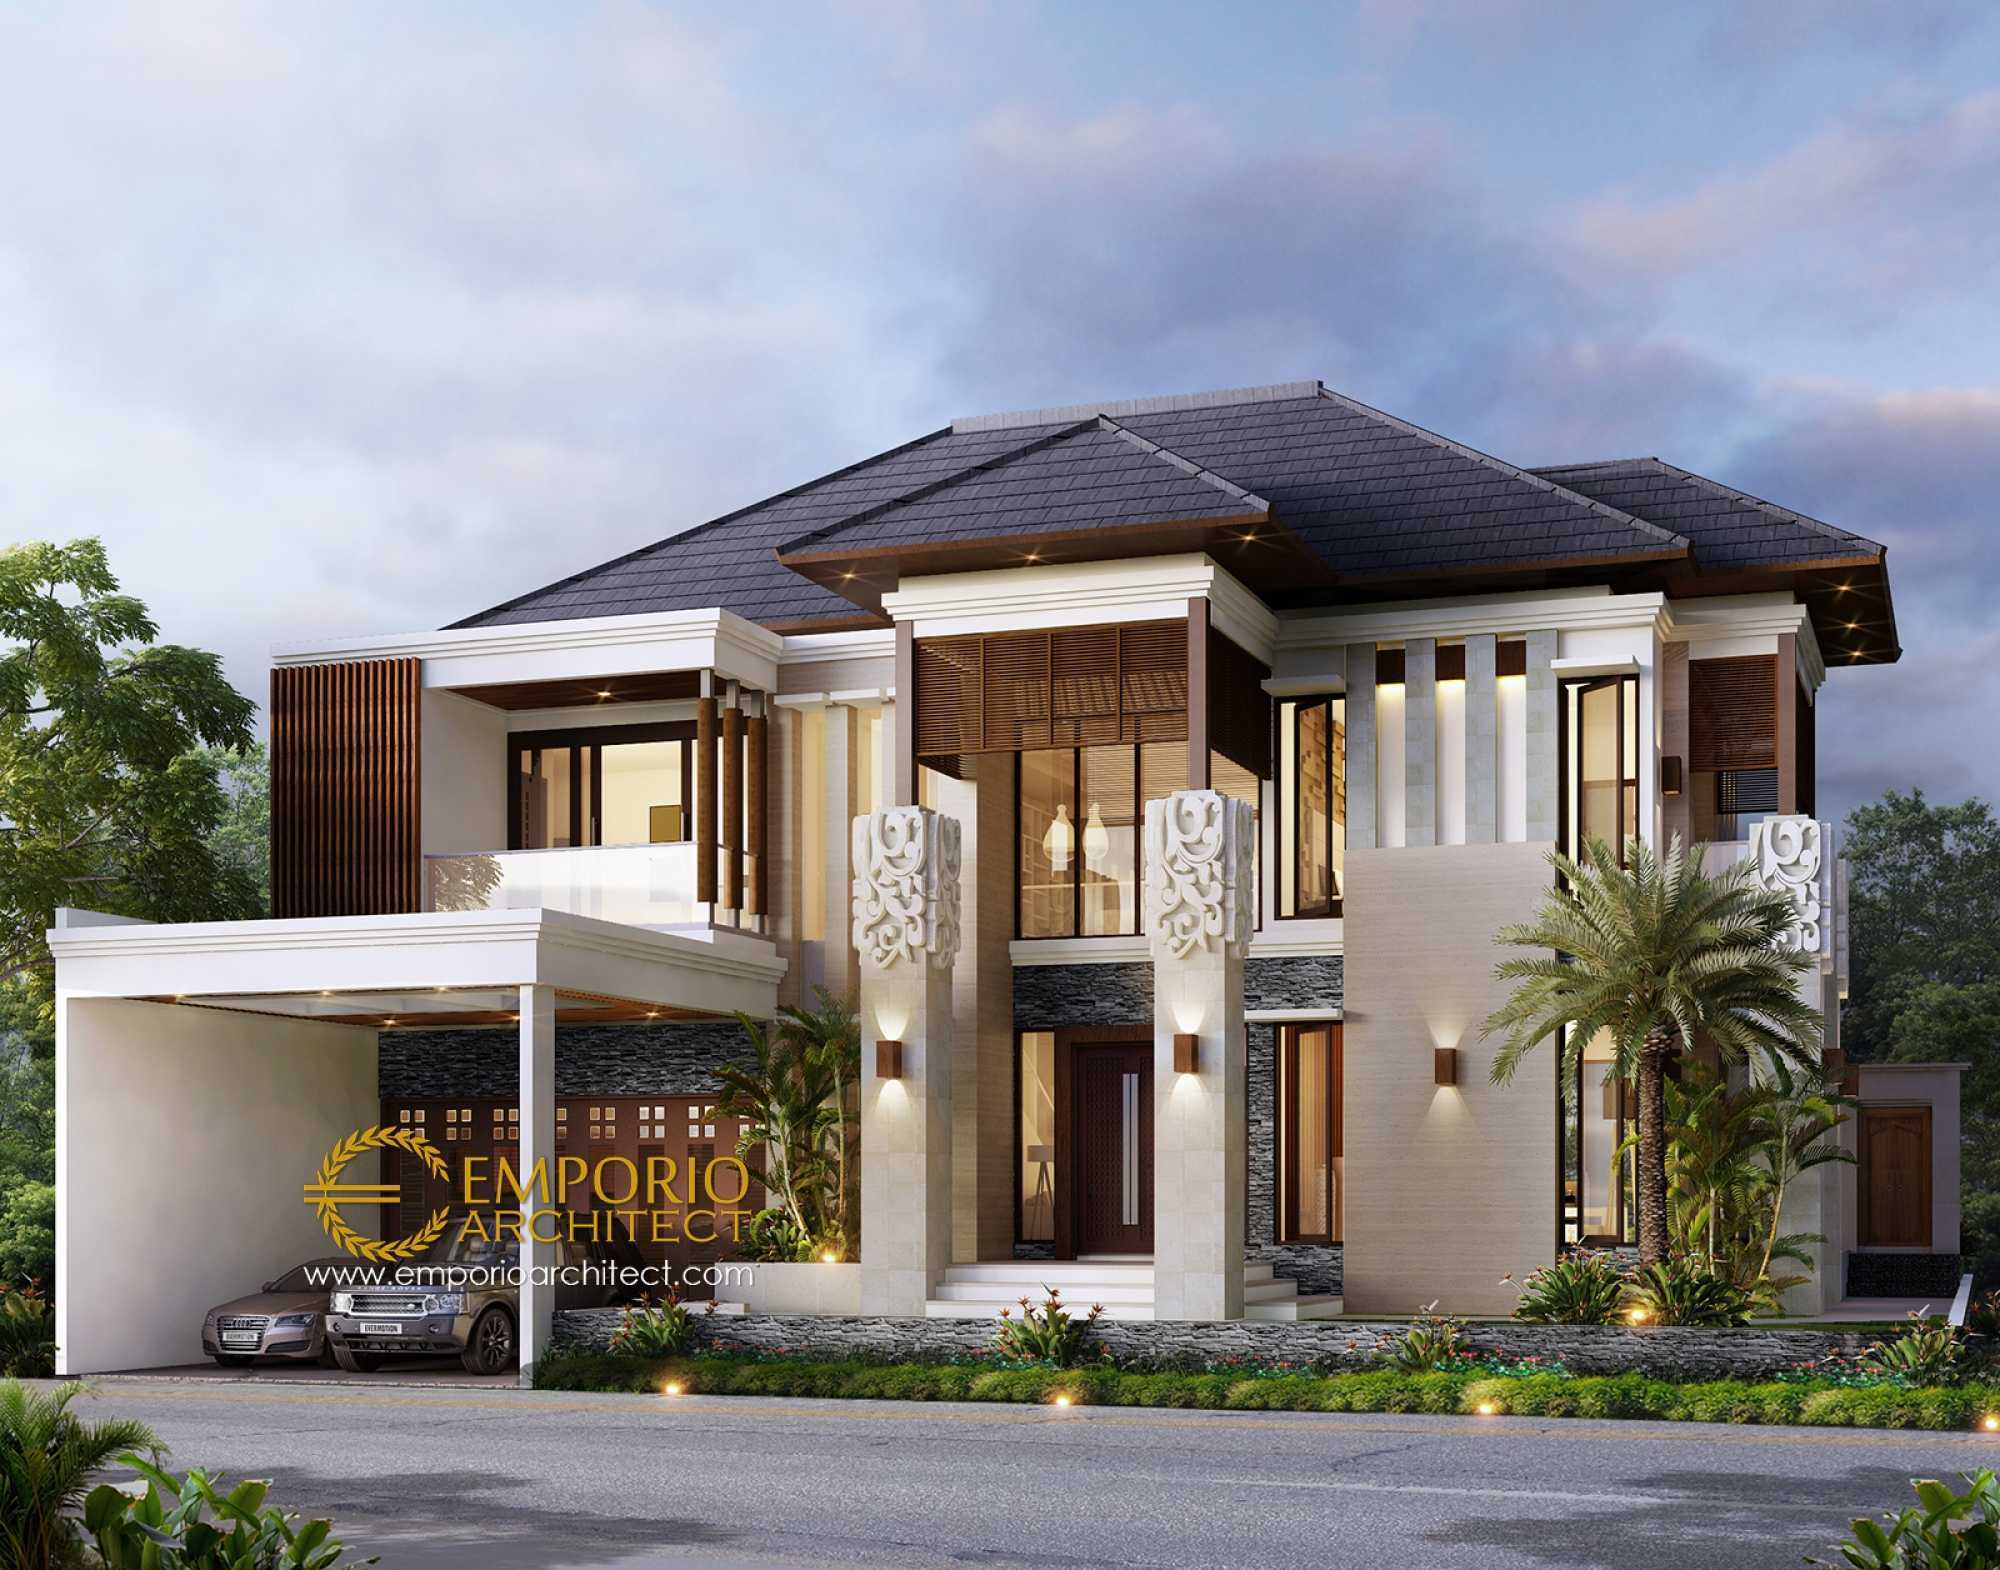 Emporio Architect Desain Rumah Villa Bali Tropis 390 @ Bekasi Bekasi, Kota Bks, Jawa Barat, Indonesia Bekasi, Kota Bks, Jawa Barat, Indonesia Emporio-Architect-Desain-Rumah-Villa-Bali-Tropis-390-Bekasi Tropical 76846